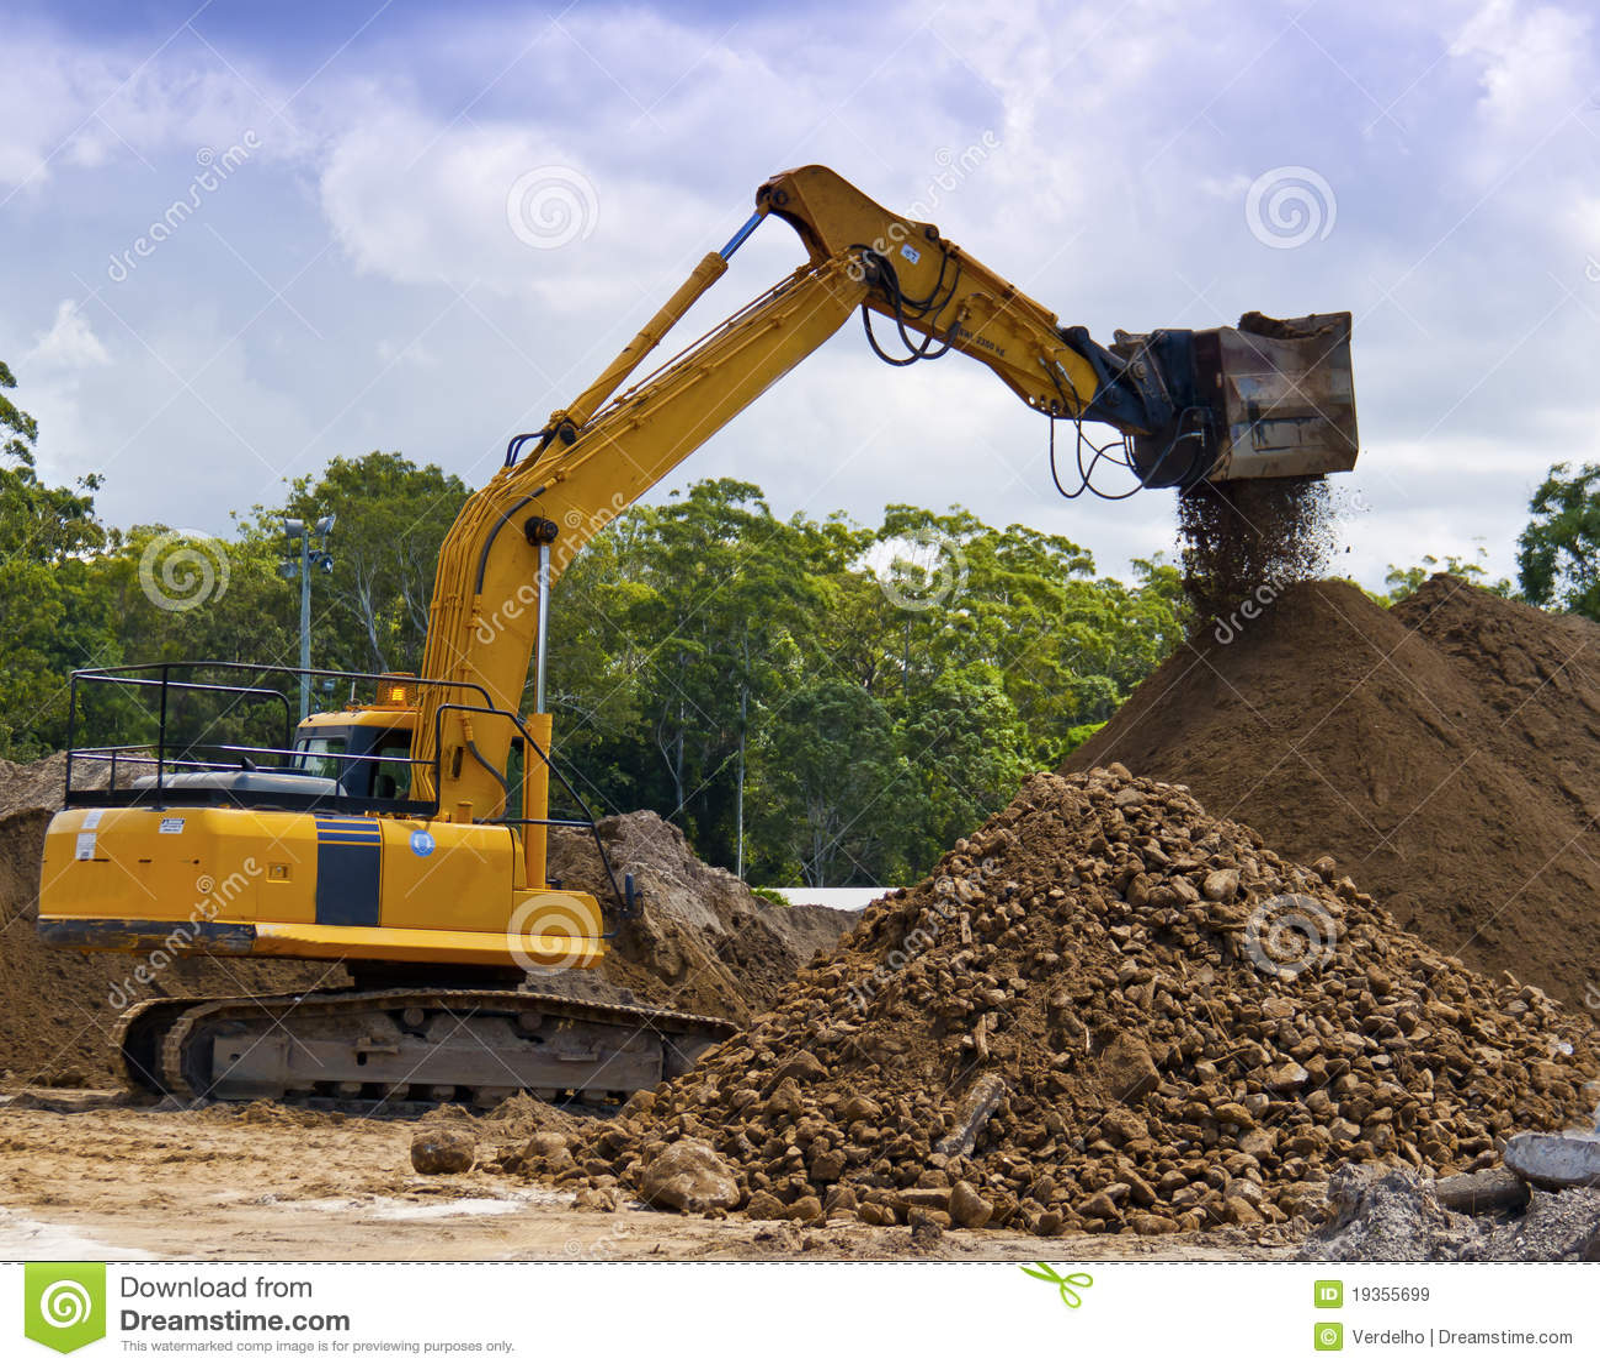 Construction Site Soil : Excavating machine screening soil stock image